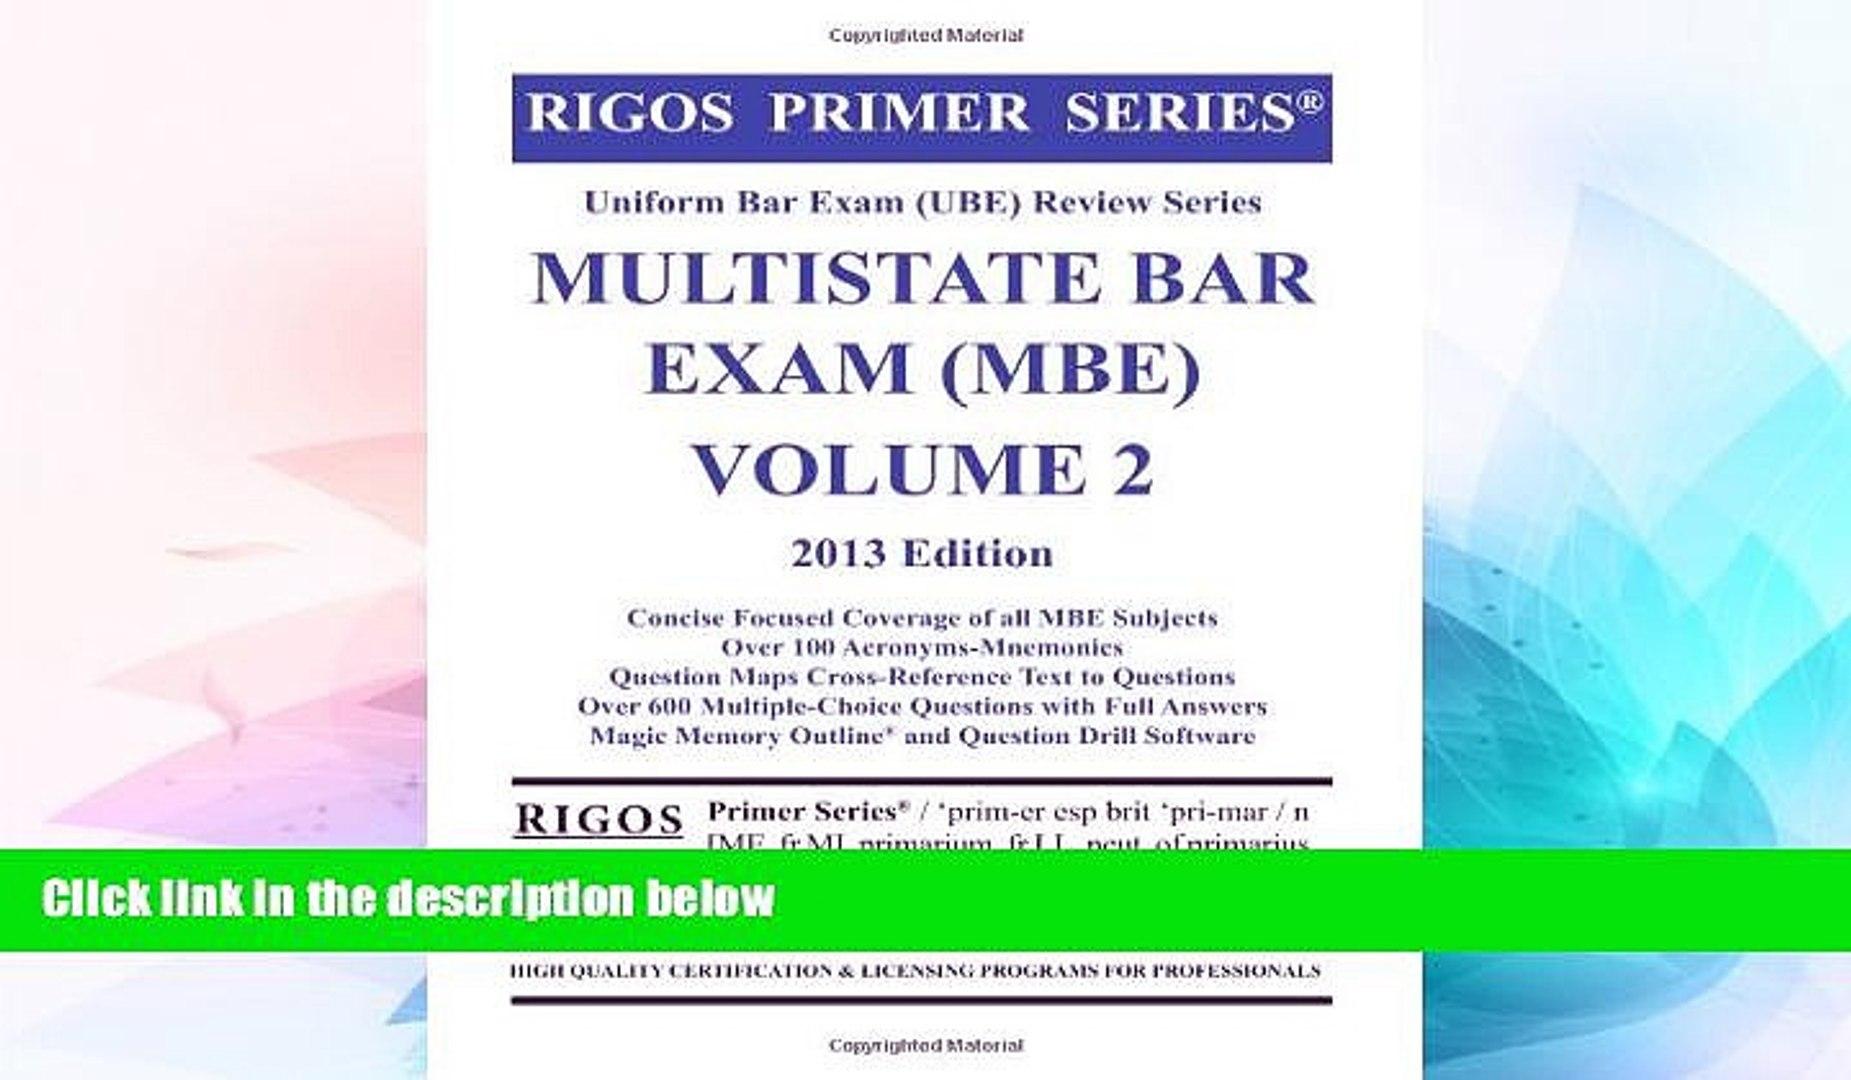 Must Have Rigos Primer Series Uniform Bar Exam (UBE) Review Series MBE Bar  Exam Volume 2 Premium